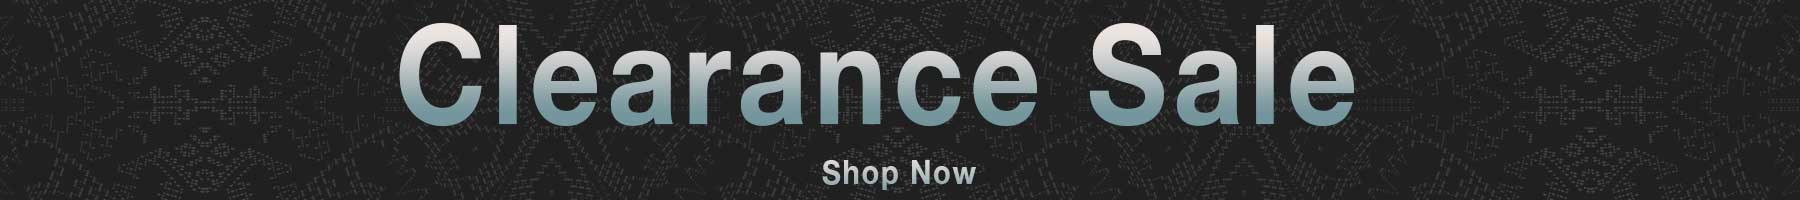 Psytshirt-Sales